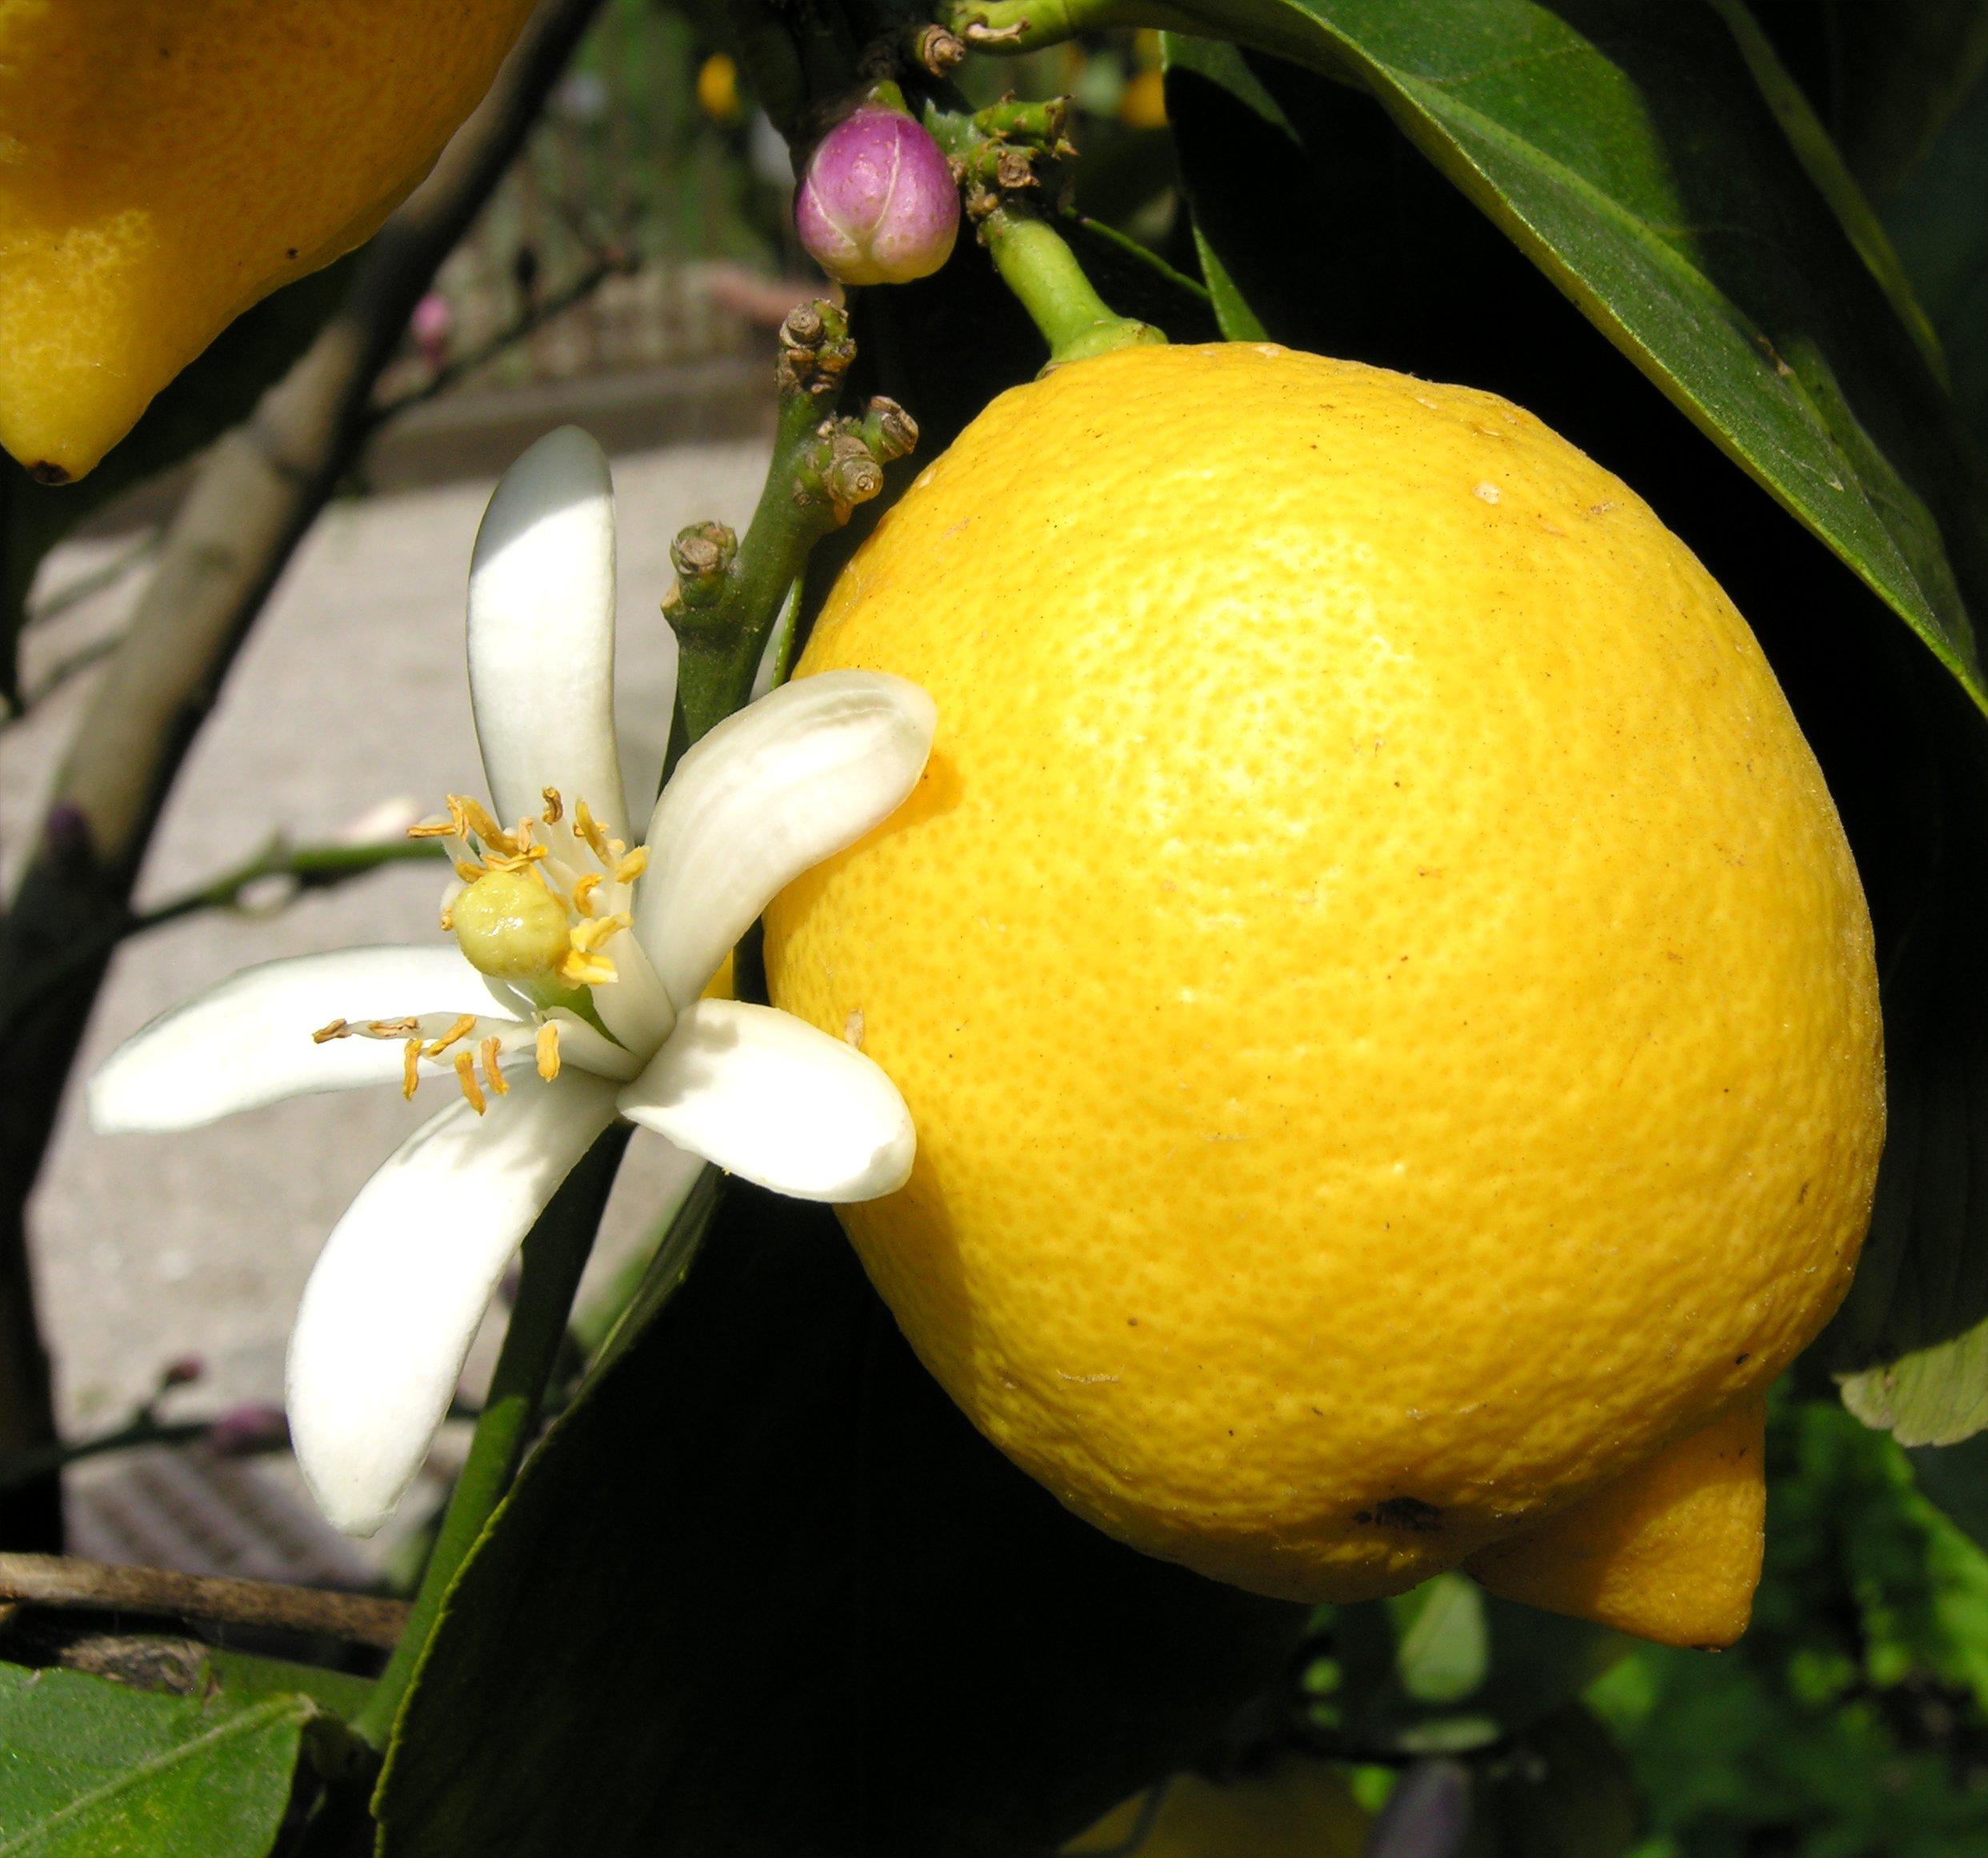 citrus limon l osbeck. Black Bedroom Furniture Sets. Home Design Ideas